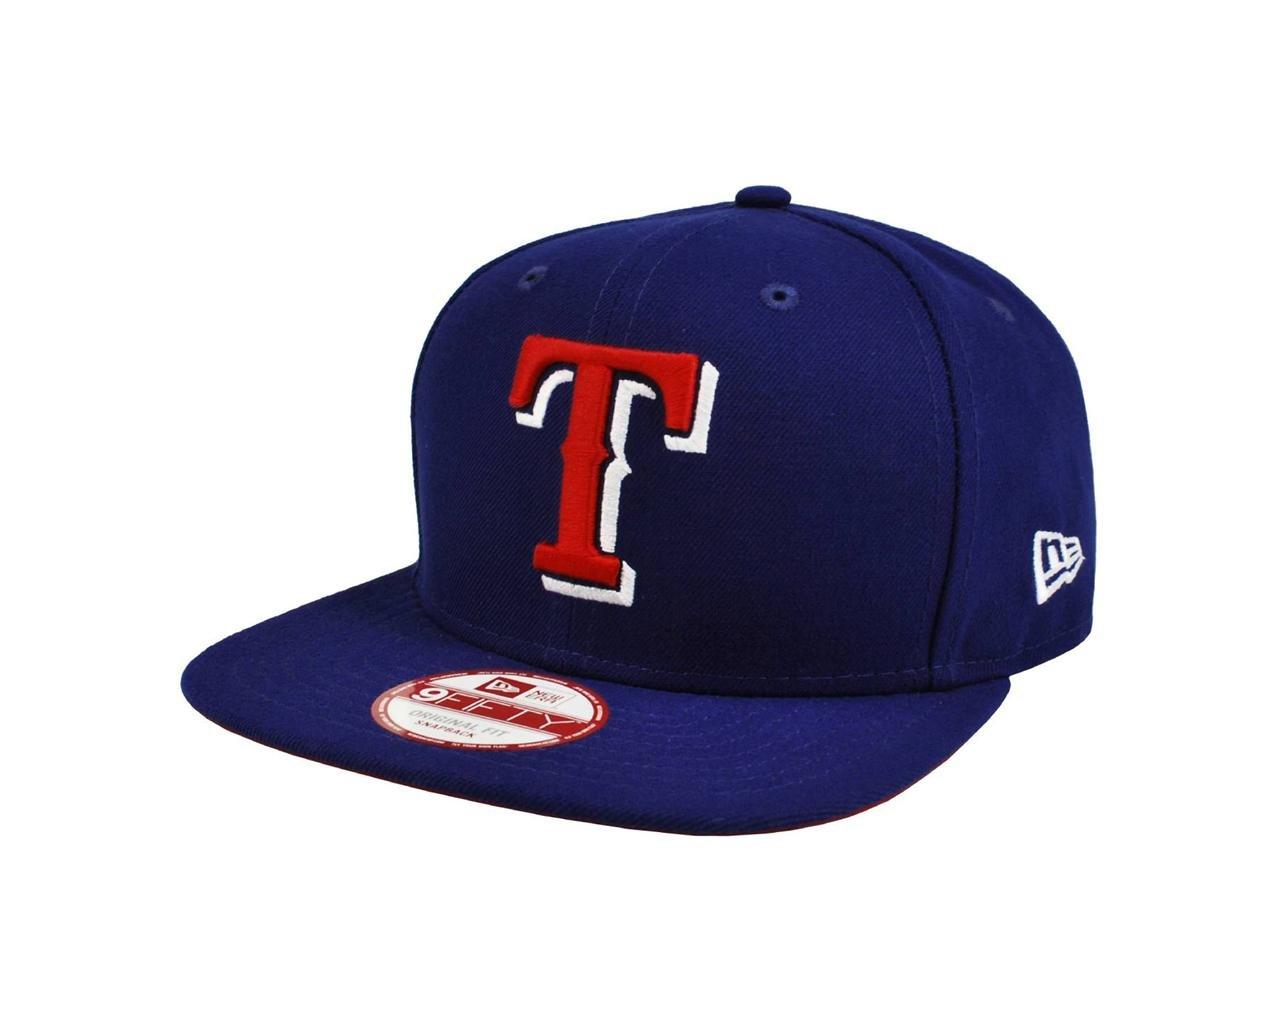 super popular ff9a8 c29d7 Amazon.com   NEW ERA 9fifty MLB Hat Texas Rangers Adjustable Practice  Baseball Dark Royal Blue Cap   Sports   Outdoors